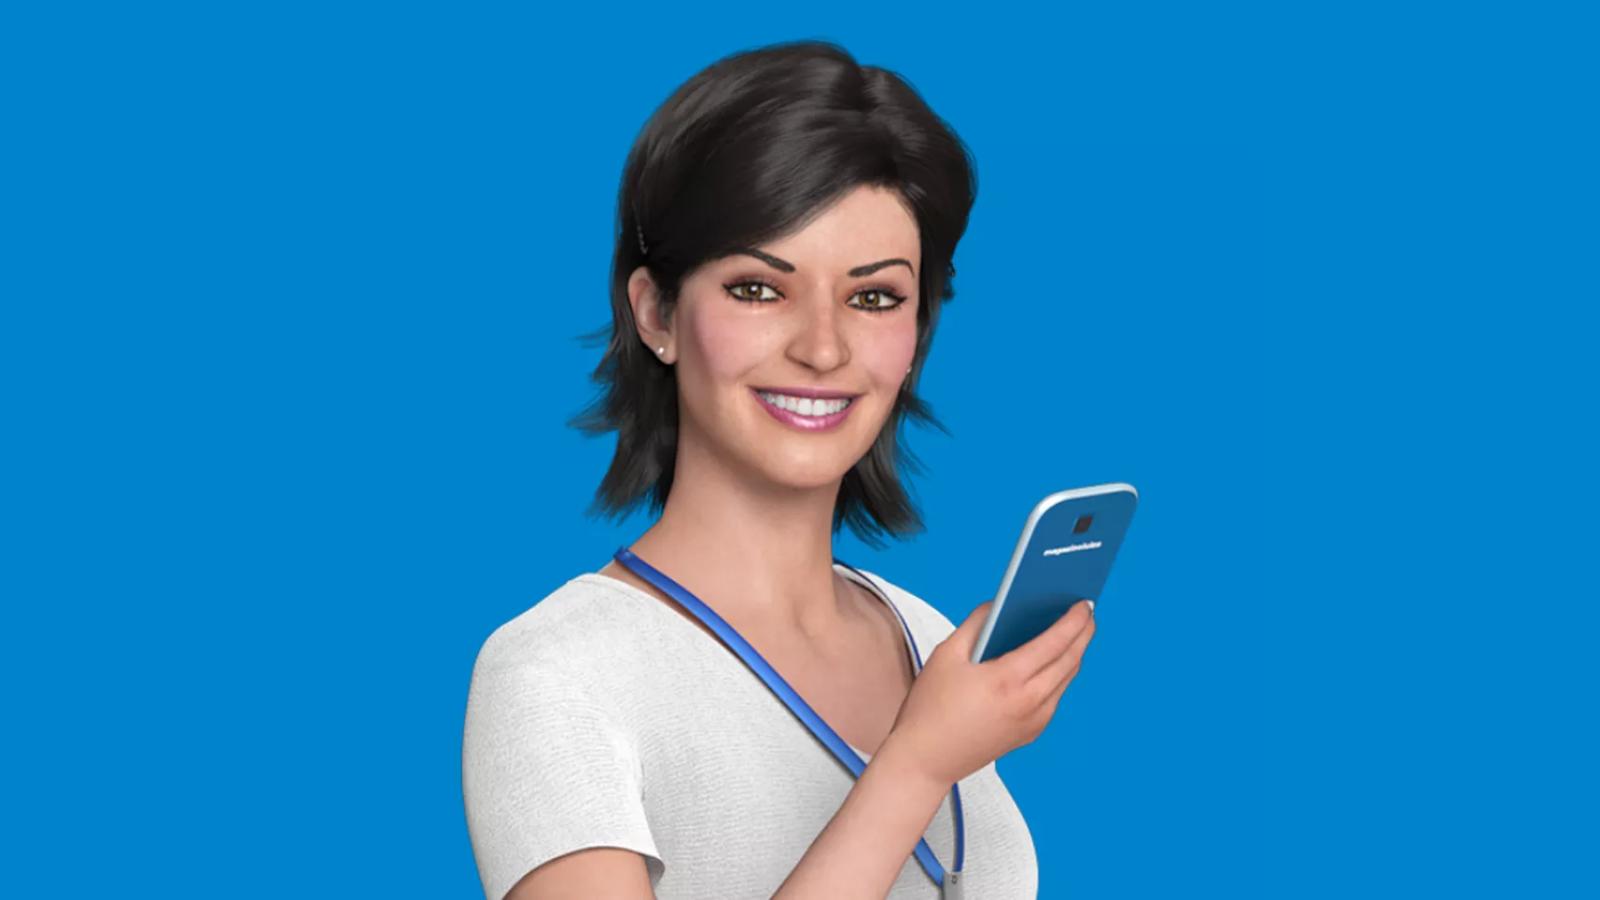 Após viralizar, Magalu muda forma de denunciar violência doméstica em app